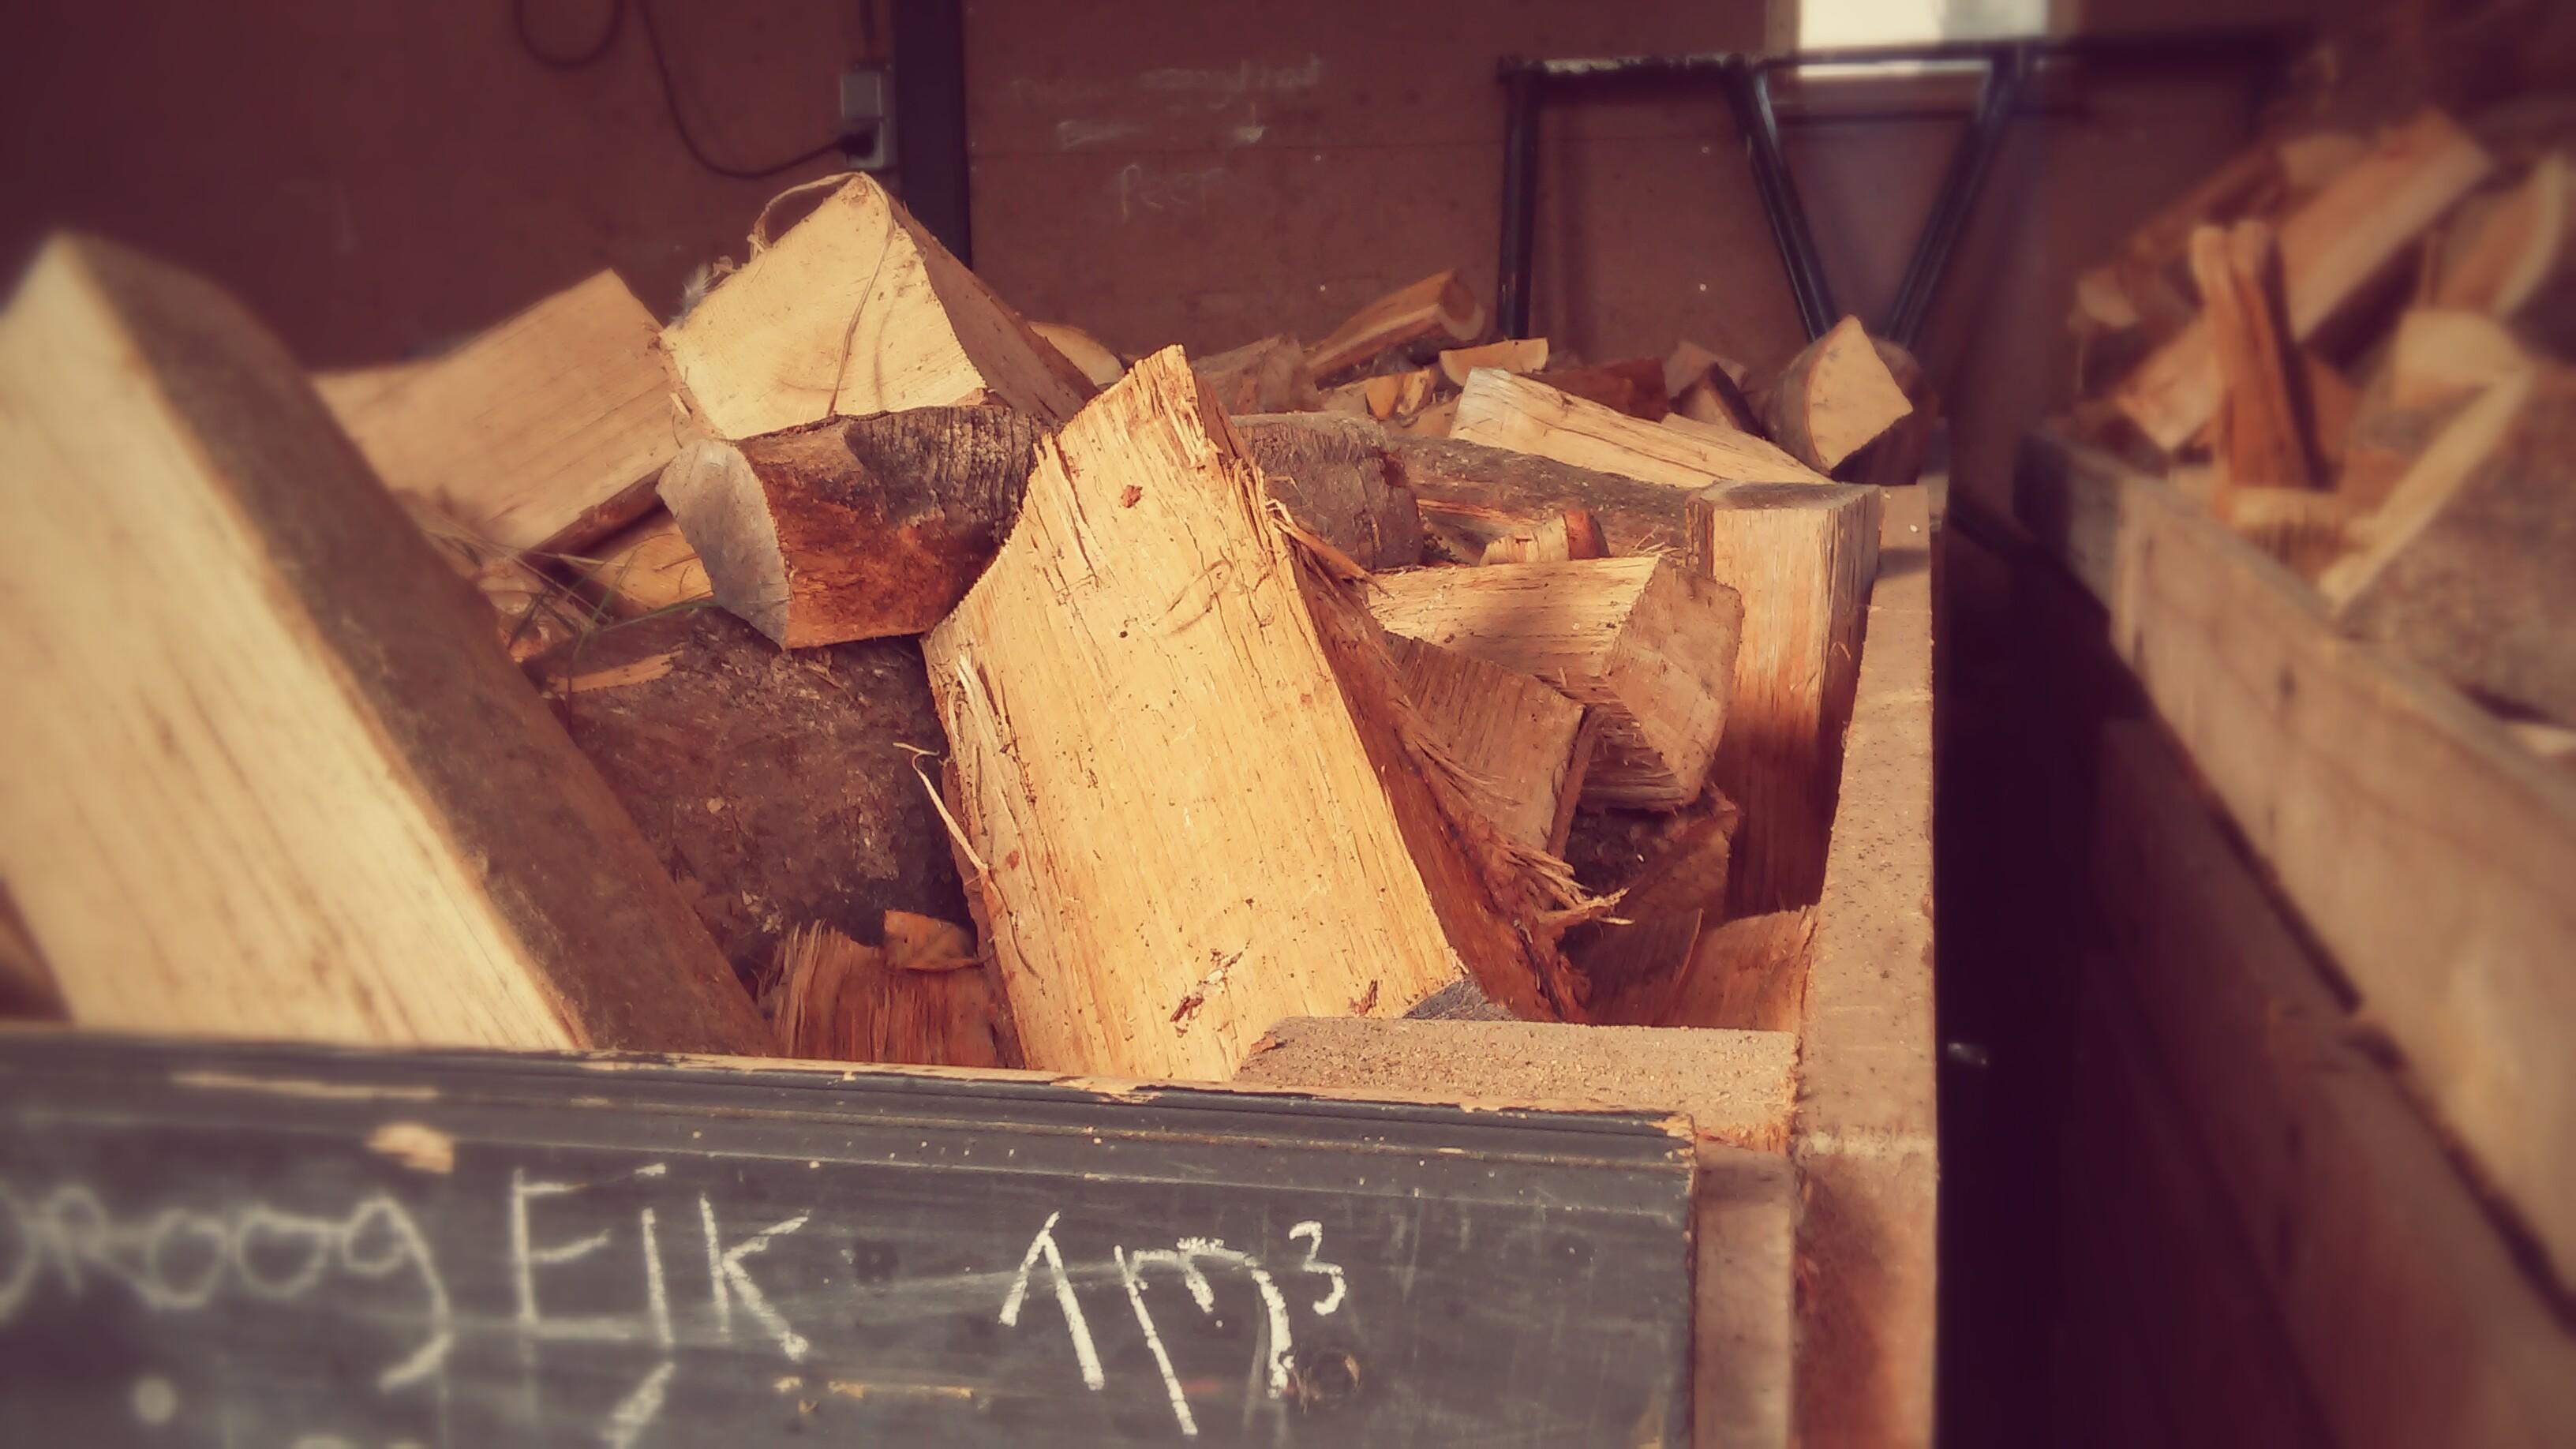 prijzen eikenhout per m3